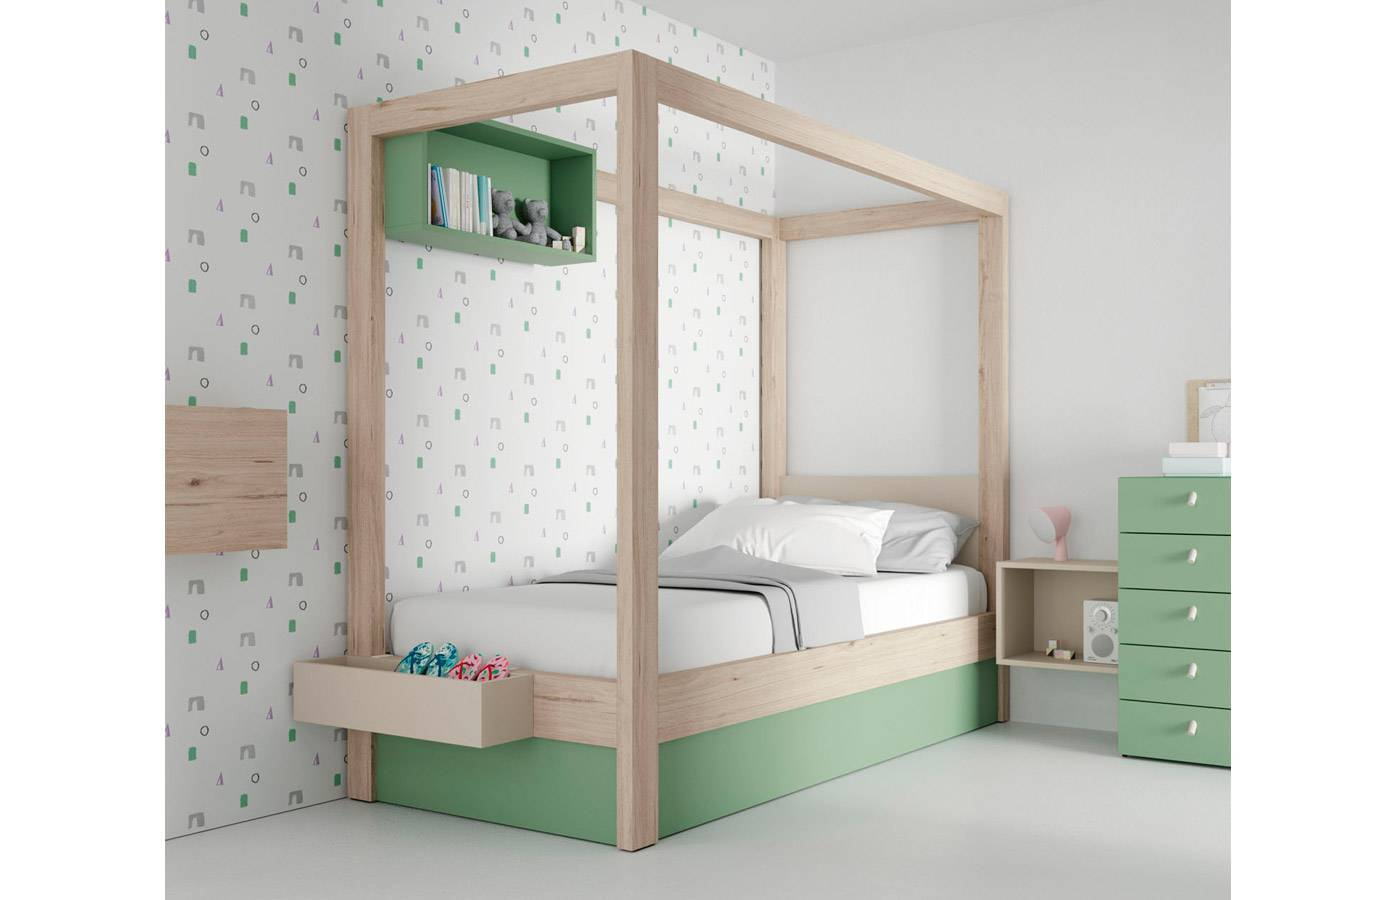 Habitación Infantil Juvenil Con Cama Con Dosel Canopy Veronese